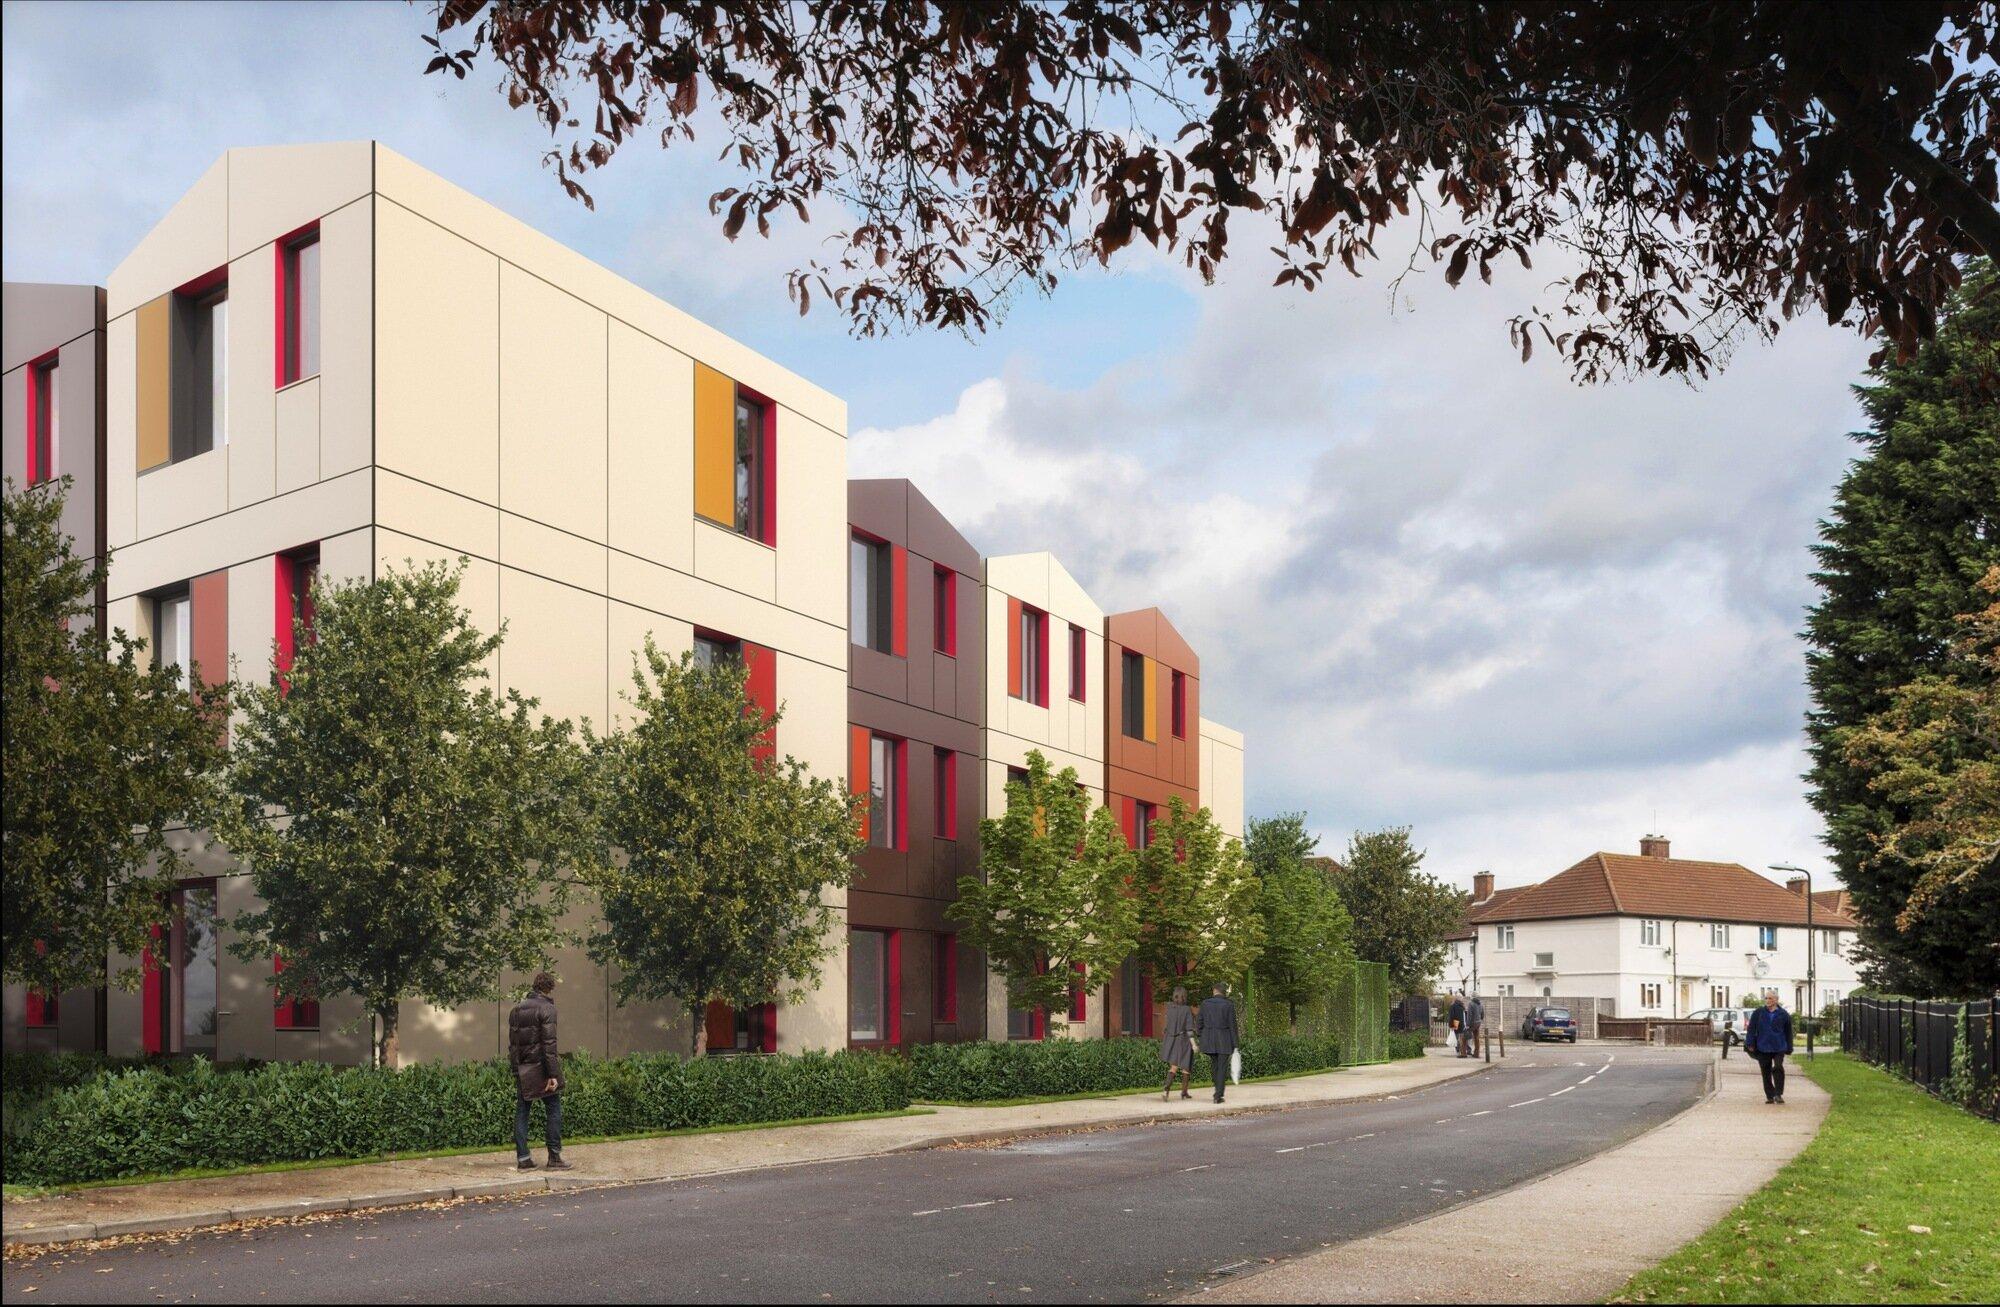 Richard Rogers - Pre-Fab Y-Cube - UK - Tiny House - Modular - Humble Homes